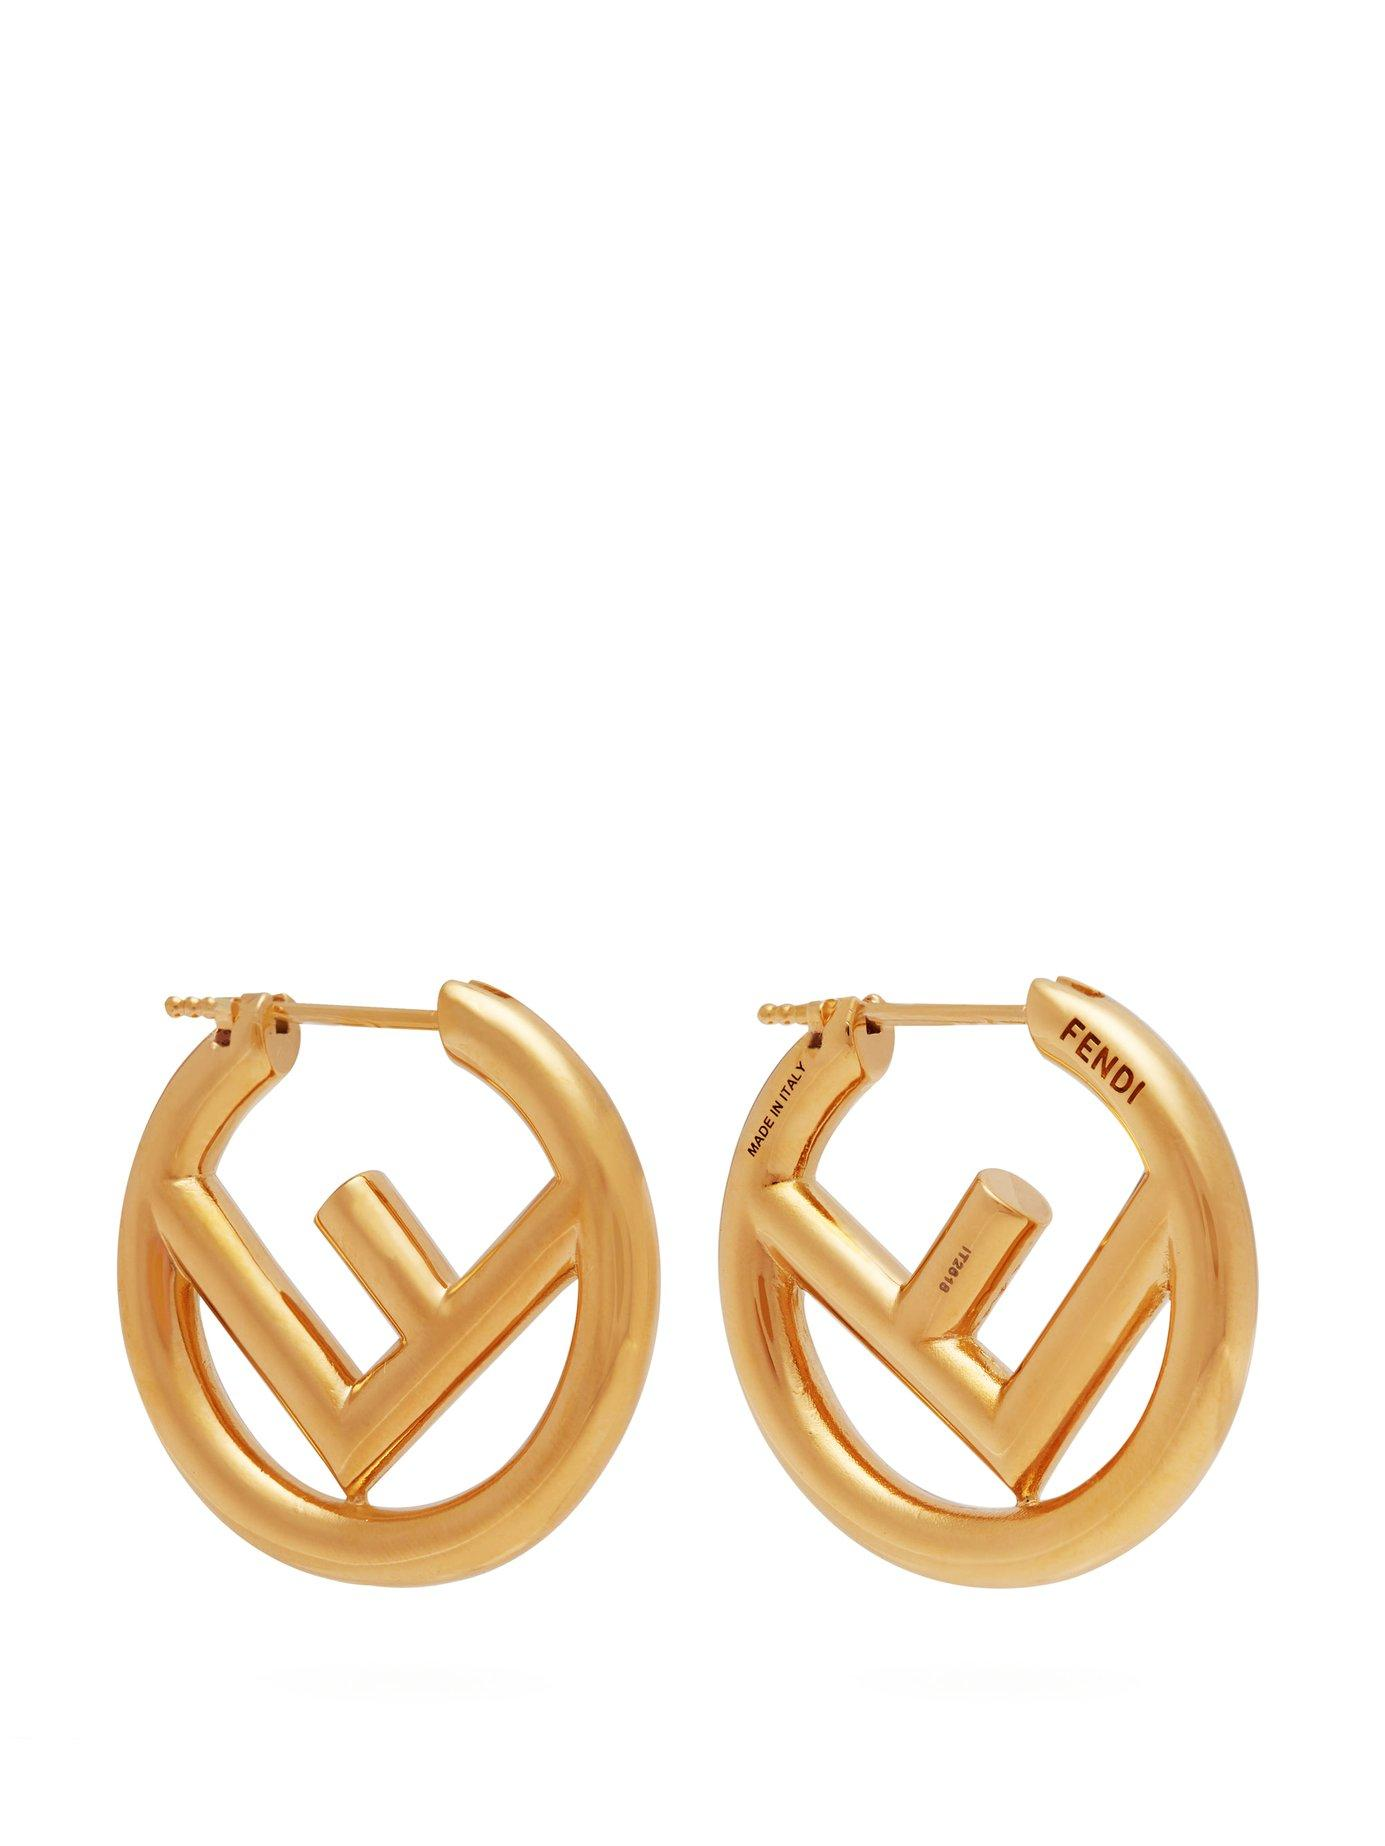 2b5dbb3e6 Fendi Ff Hoop Earrings In Gold | ModeSens